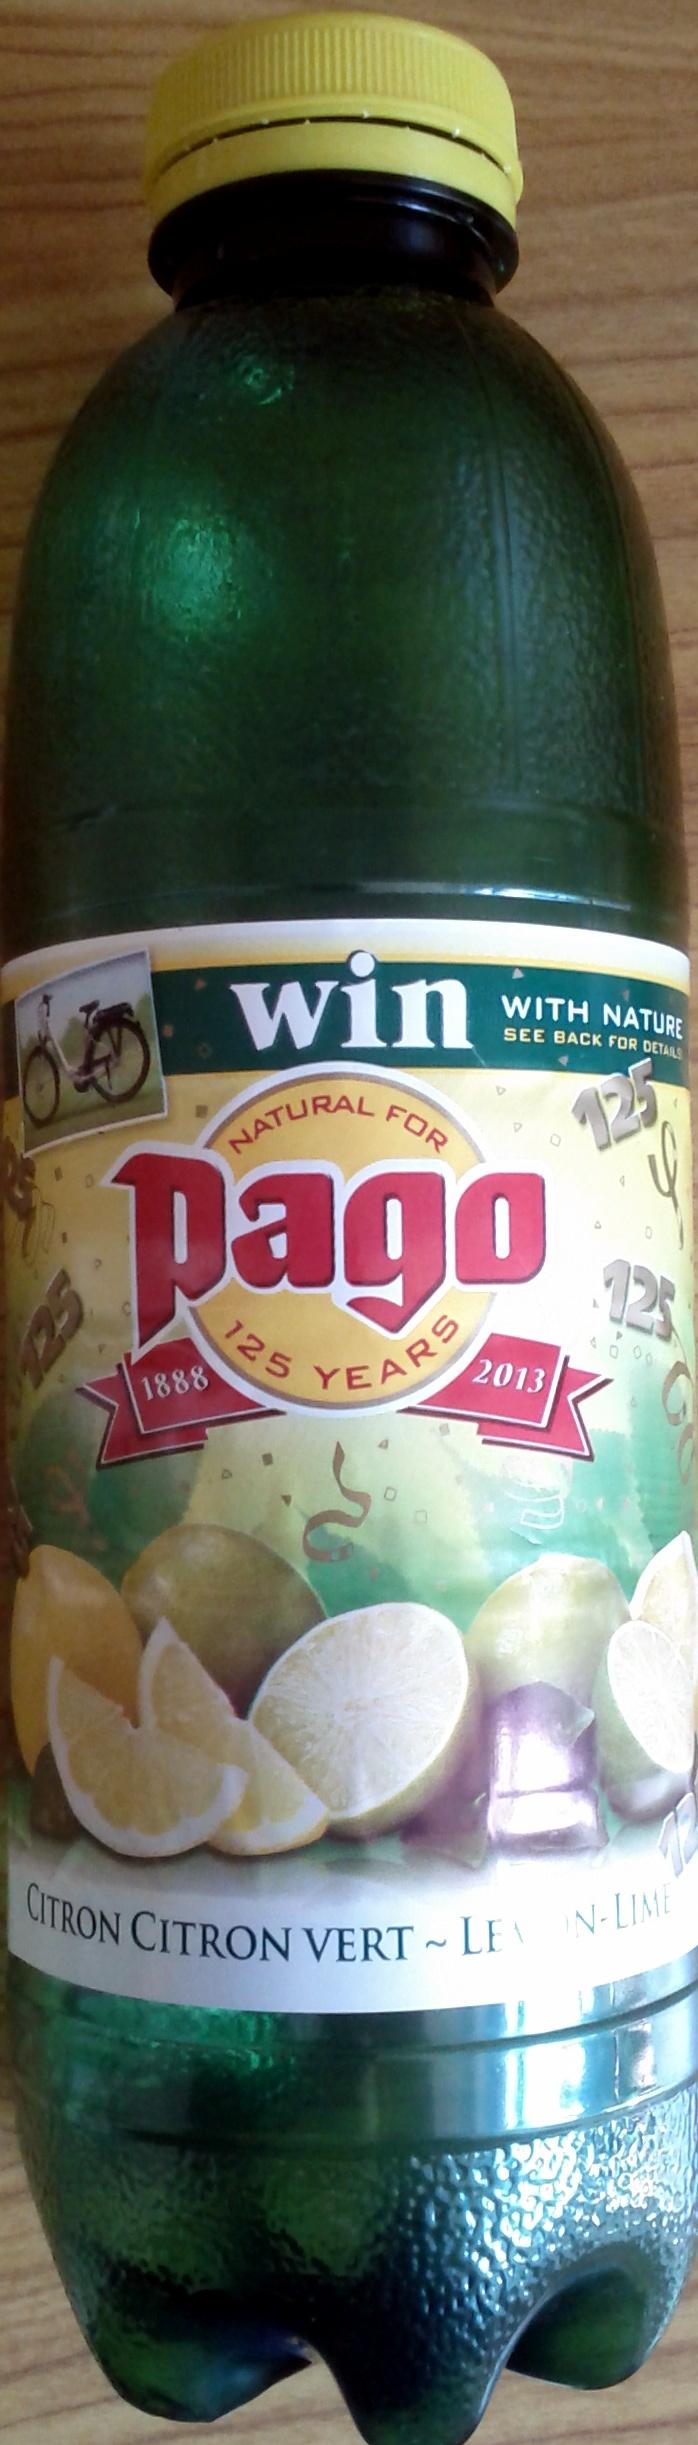 Pago Citron - Citron vert - Product